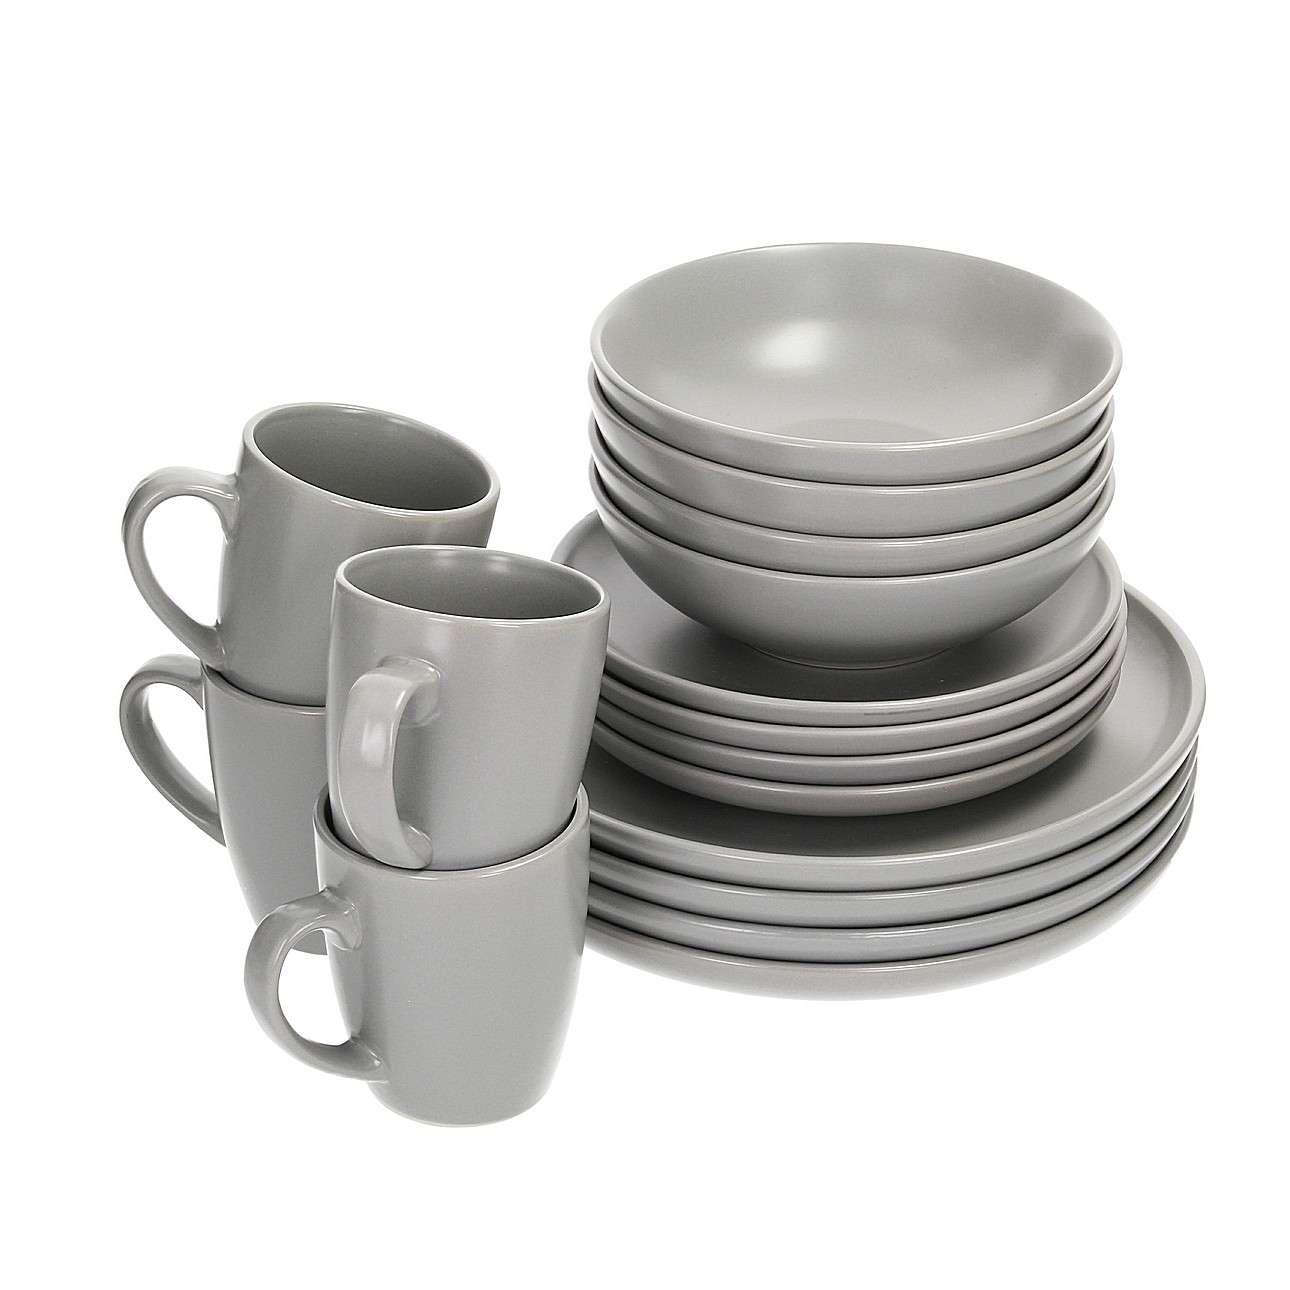 Zestaw obiadowy Vivo Grey 4/16